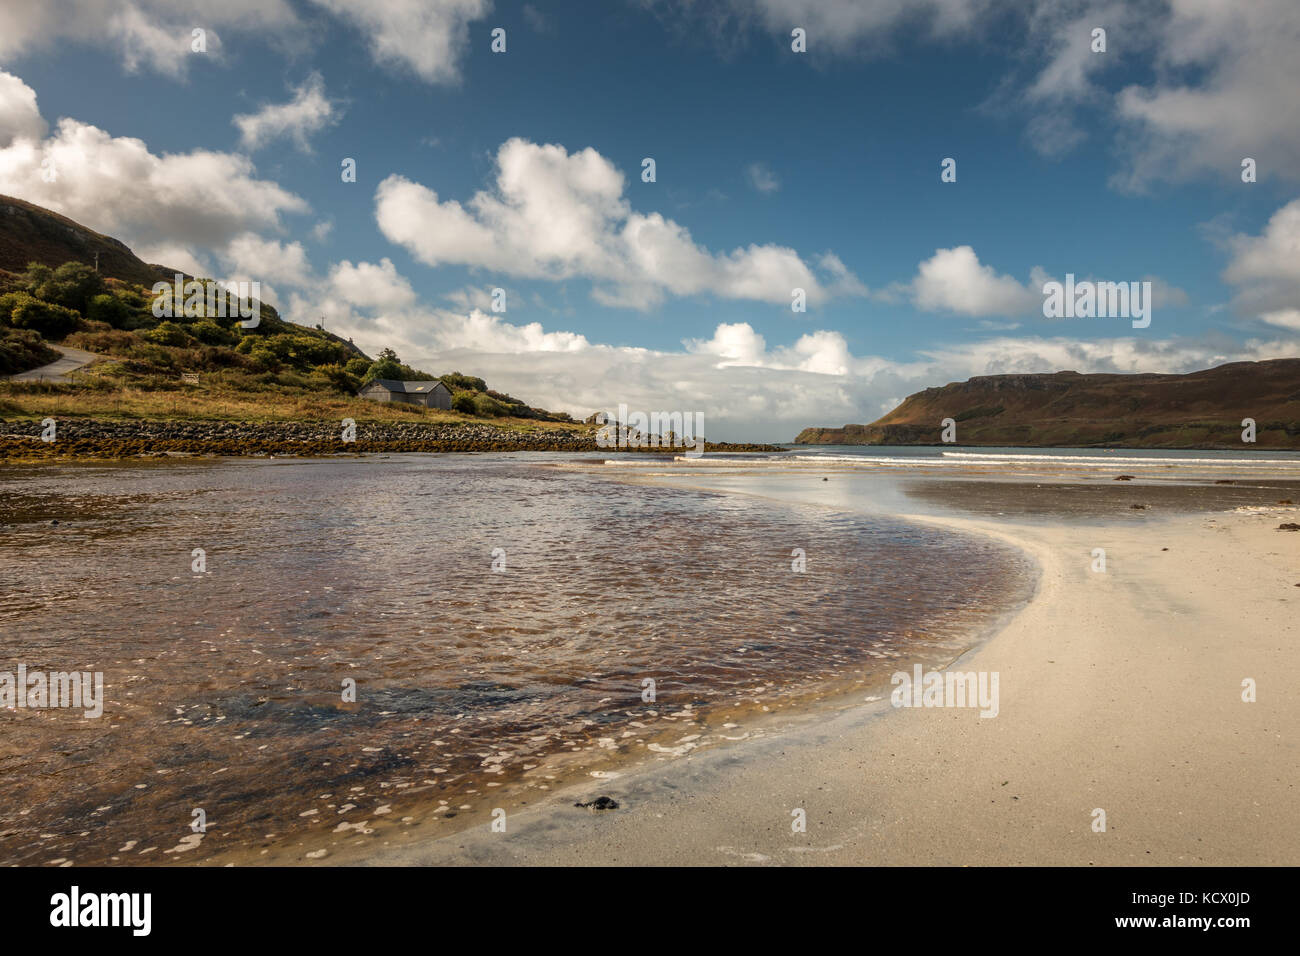 One of the few sandy beaches on Mull - Calgary Bay beach, Isle of Mull, Scotland Stock Photo